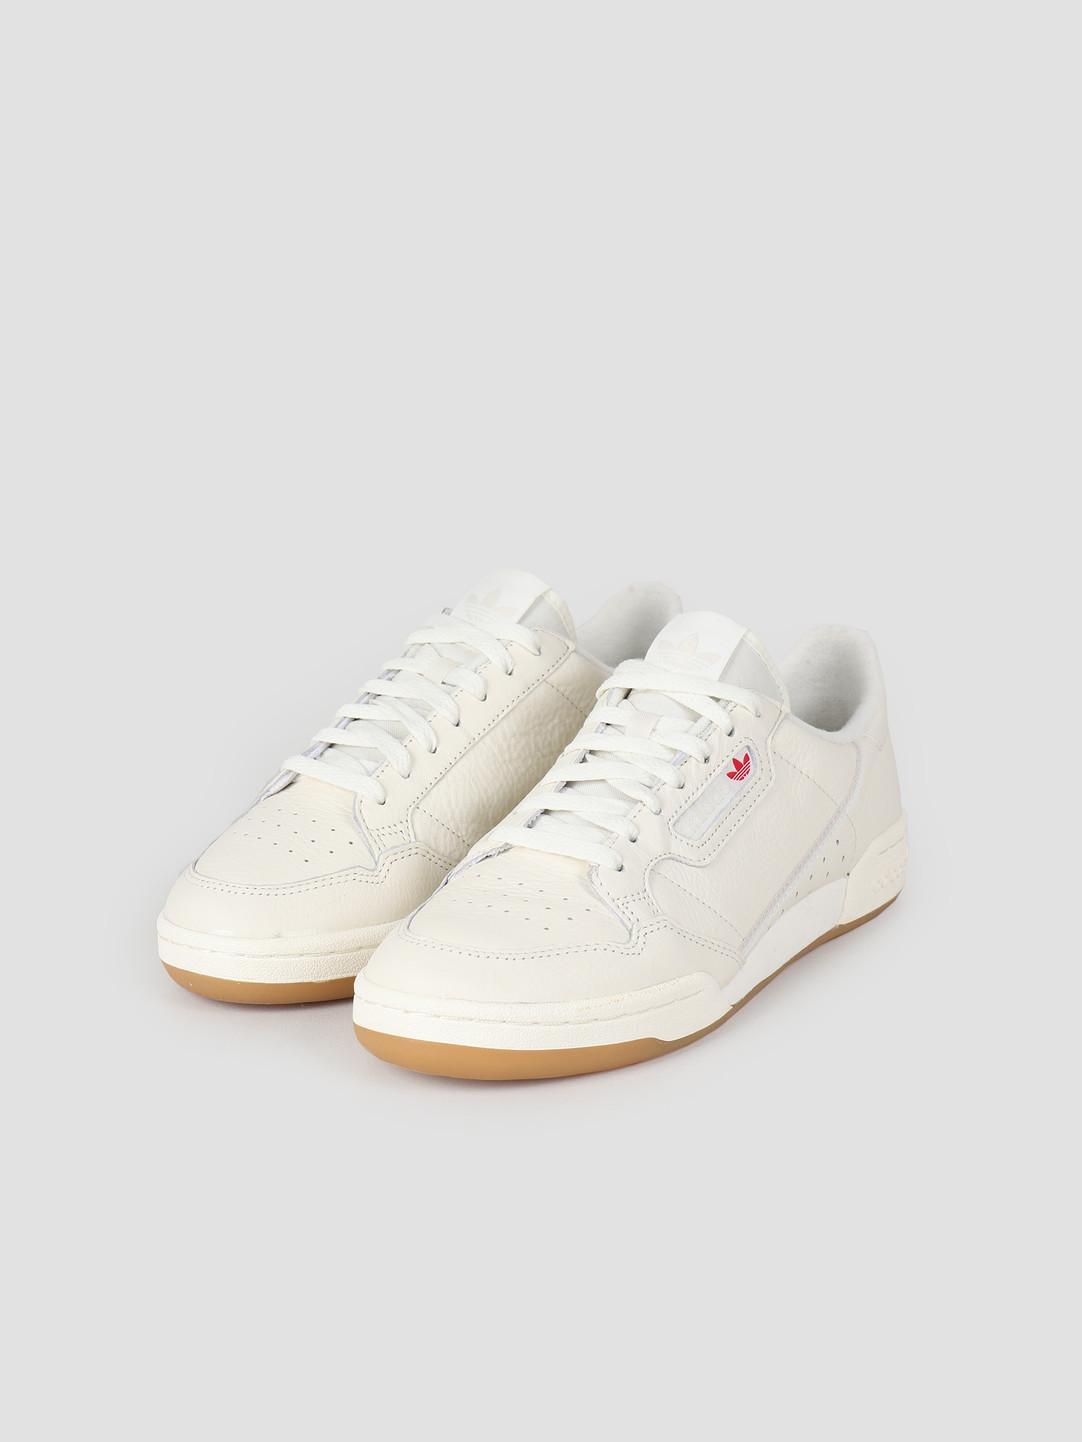 adidas adidas Continental 80 Owhite Rawwht Gum3 BD7975